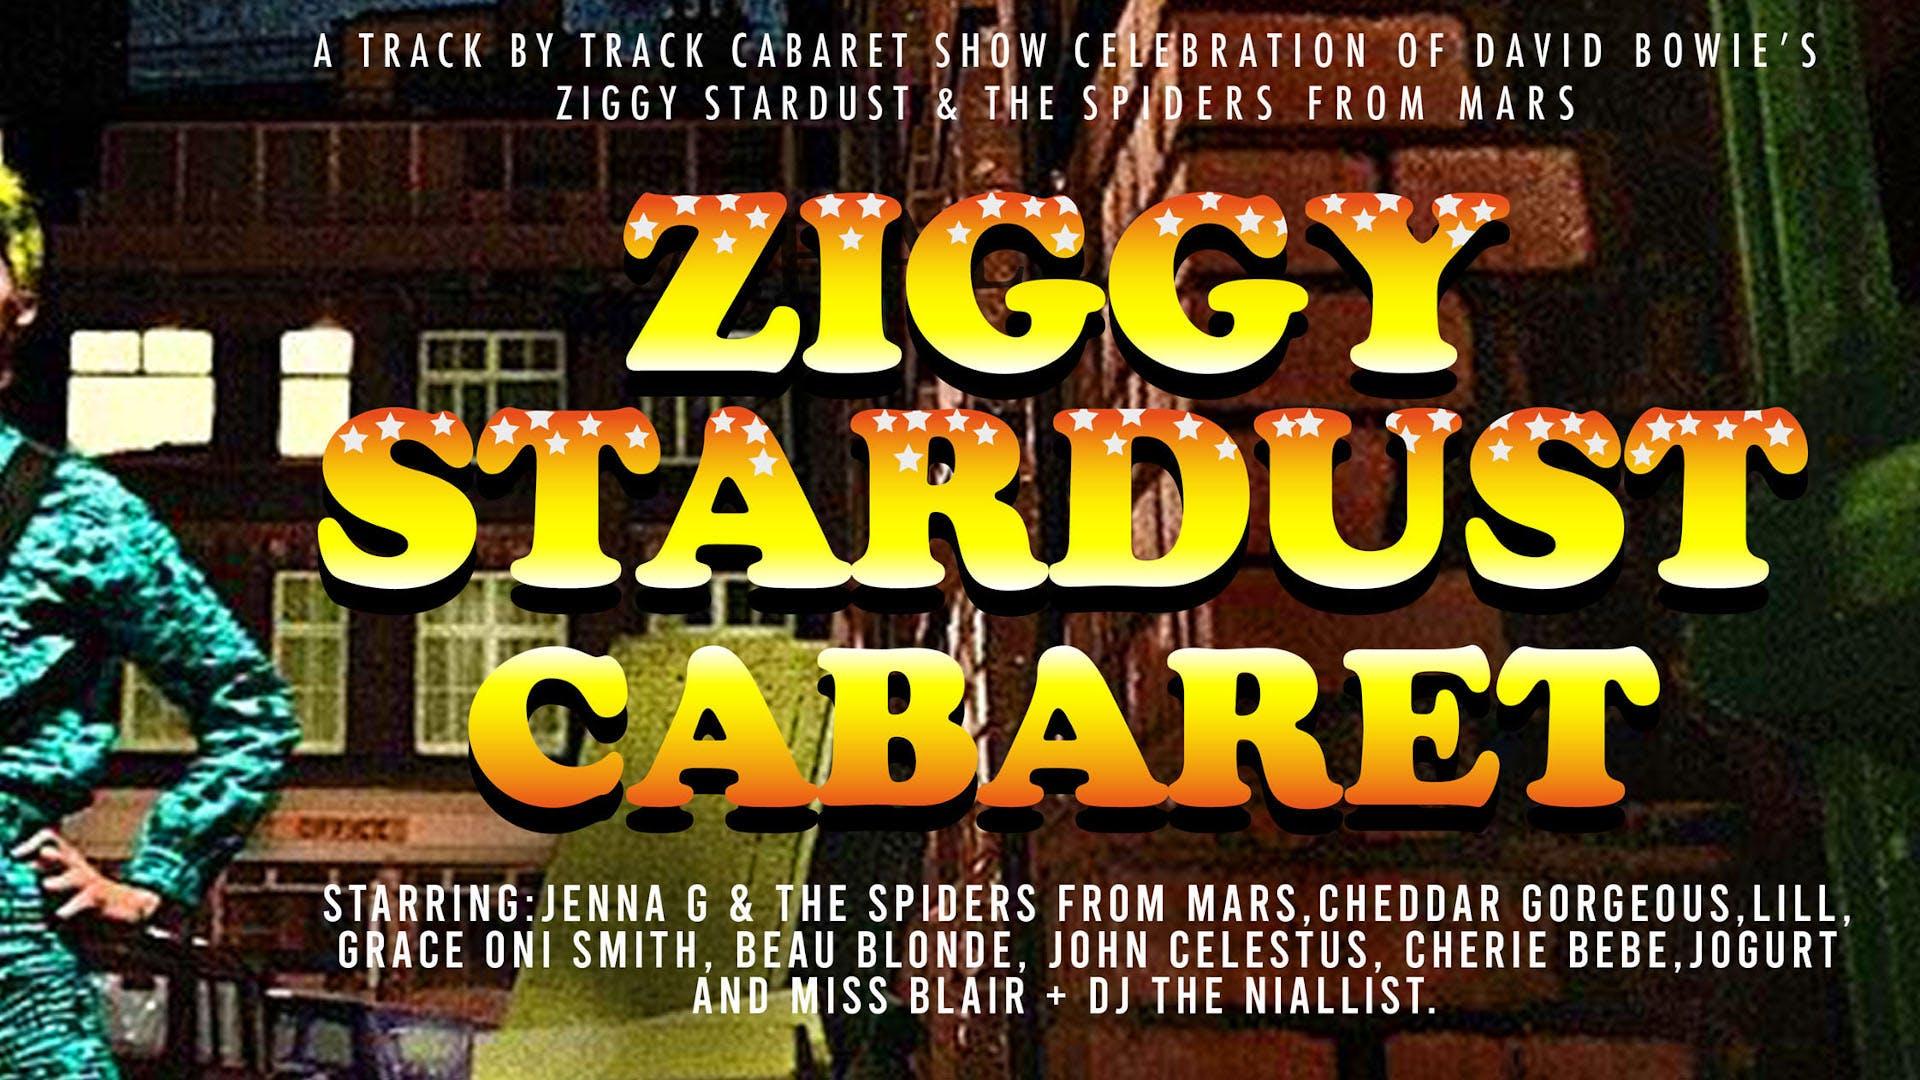 ZIGGY CABARET: THE PERFORMERS